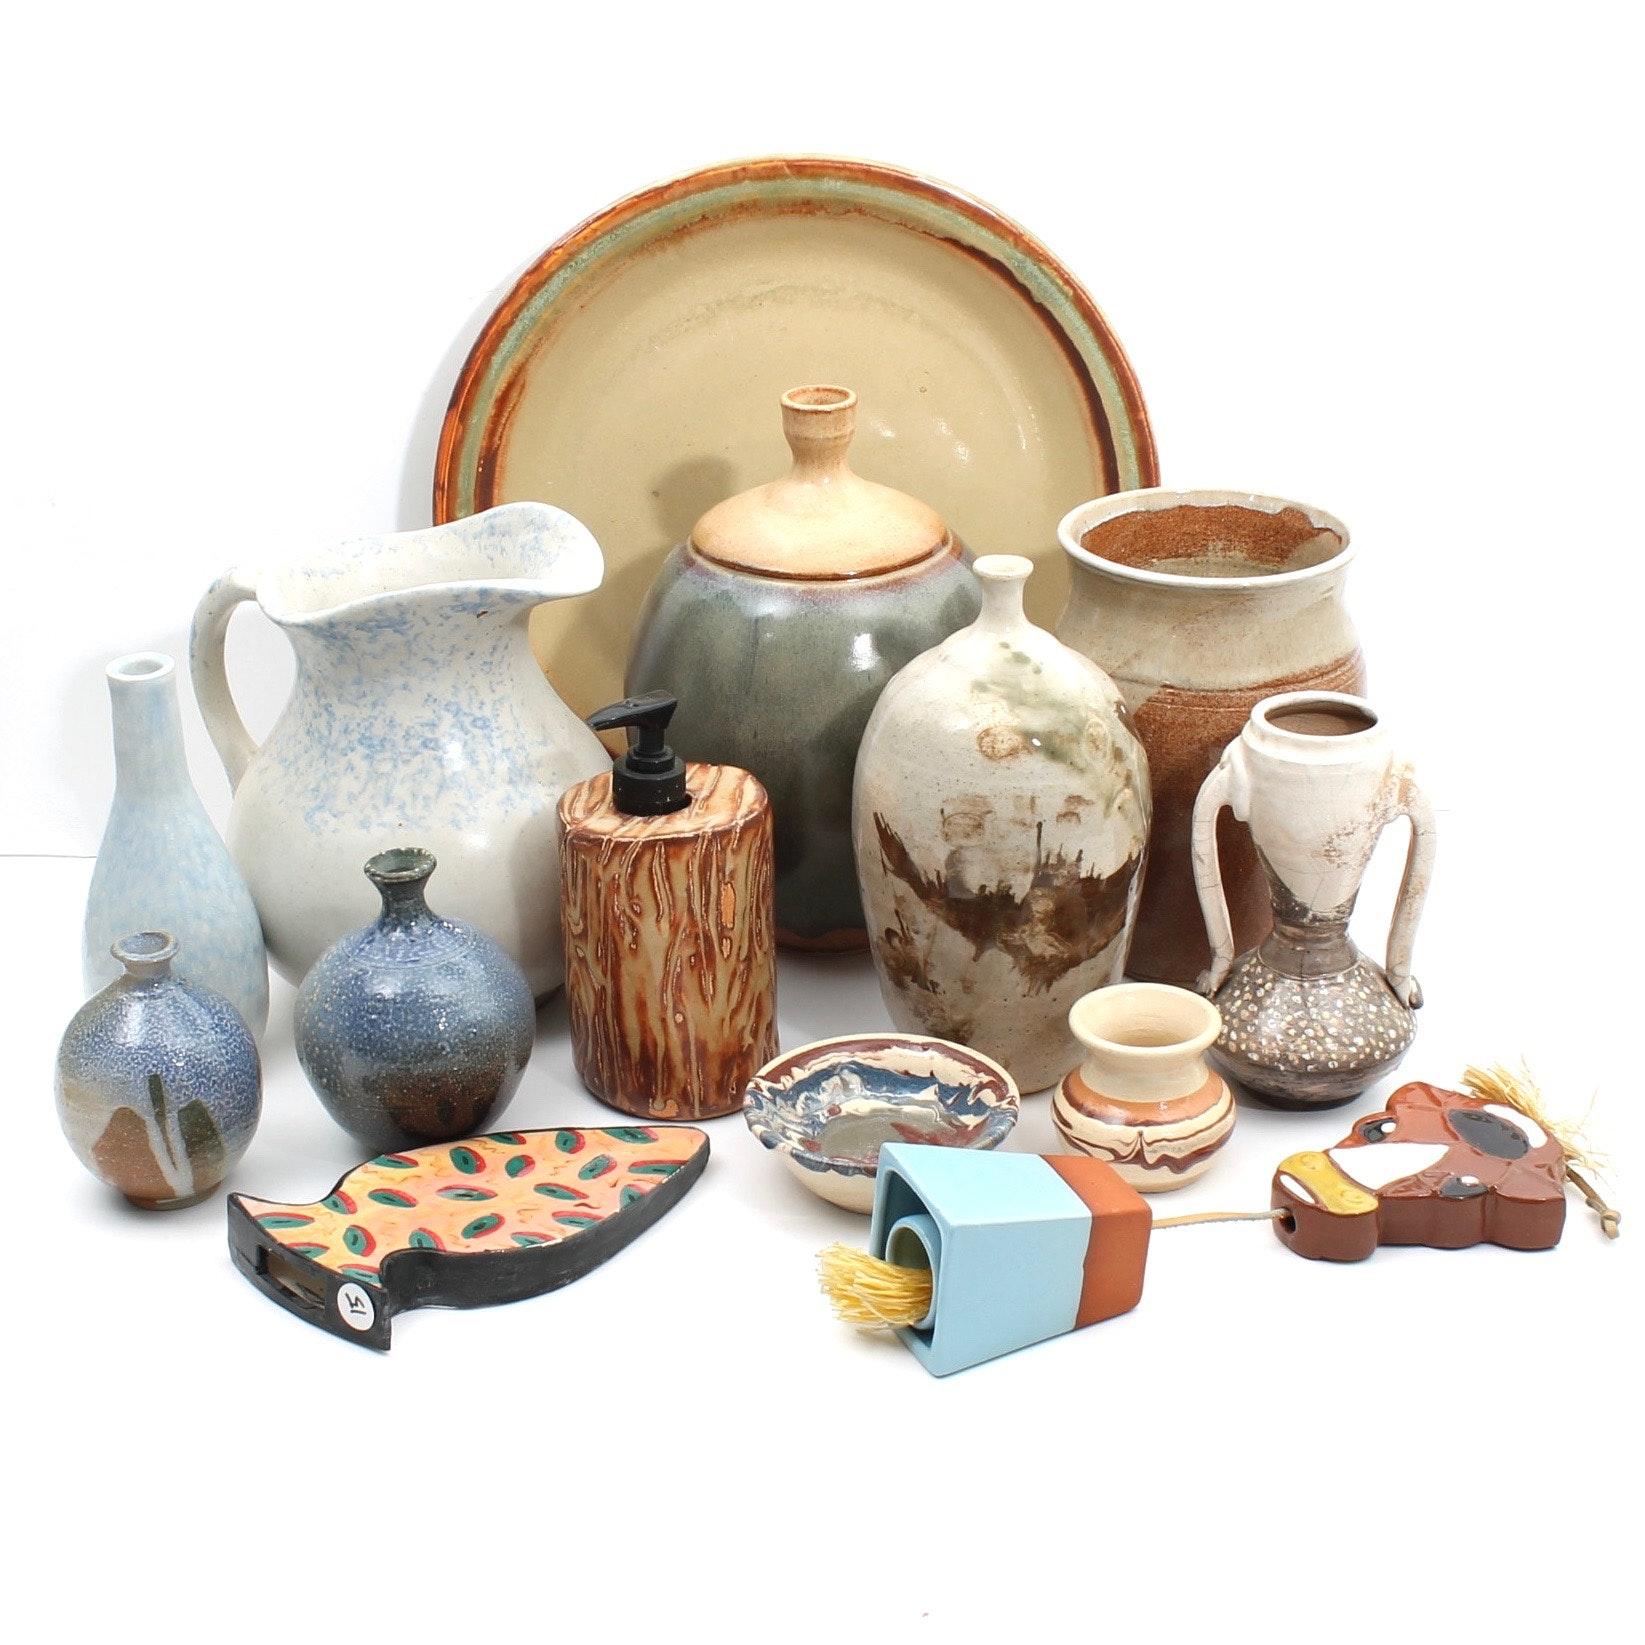 Borthwick Hand Thrown Stoneware Home Accessories and Decor